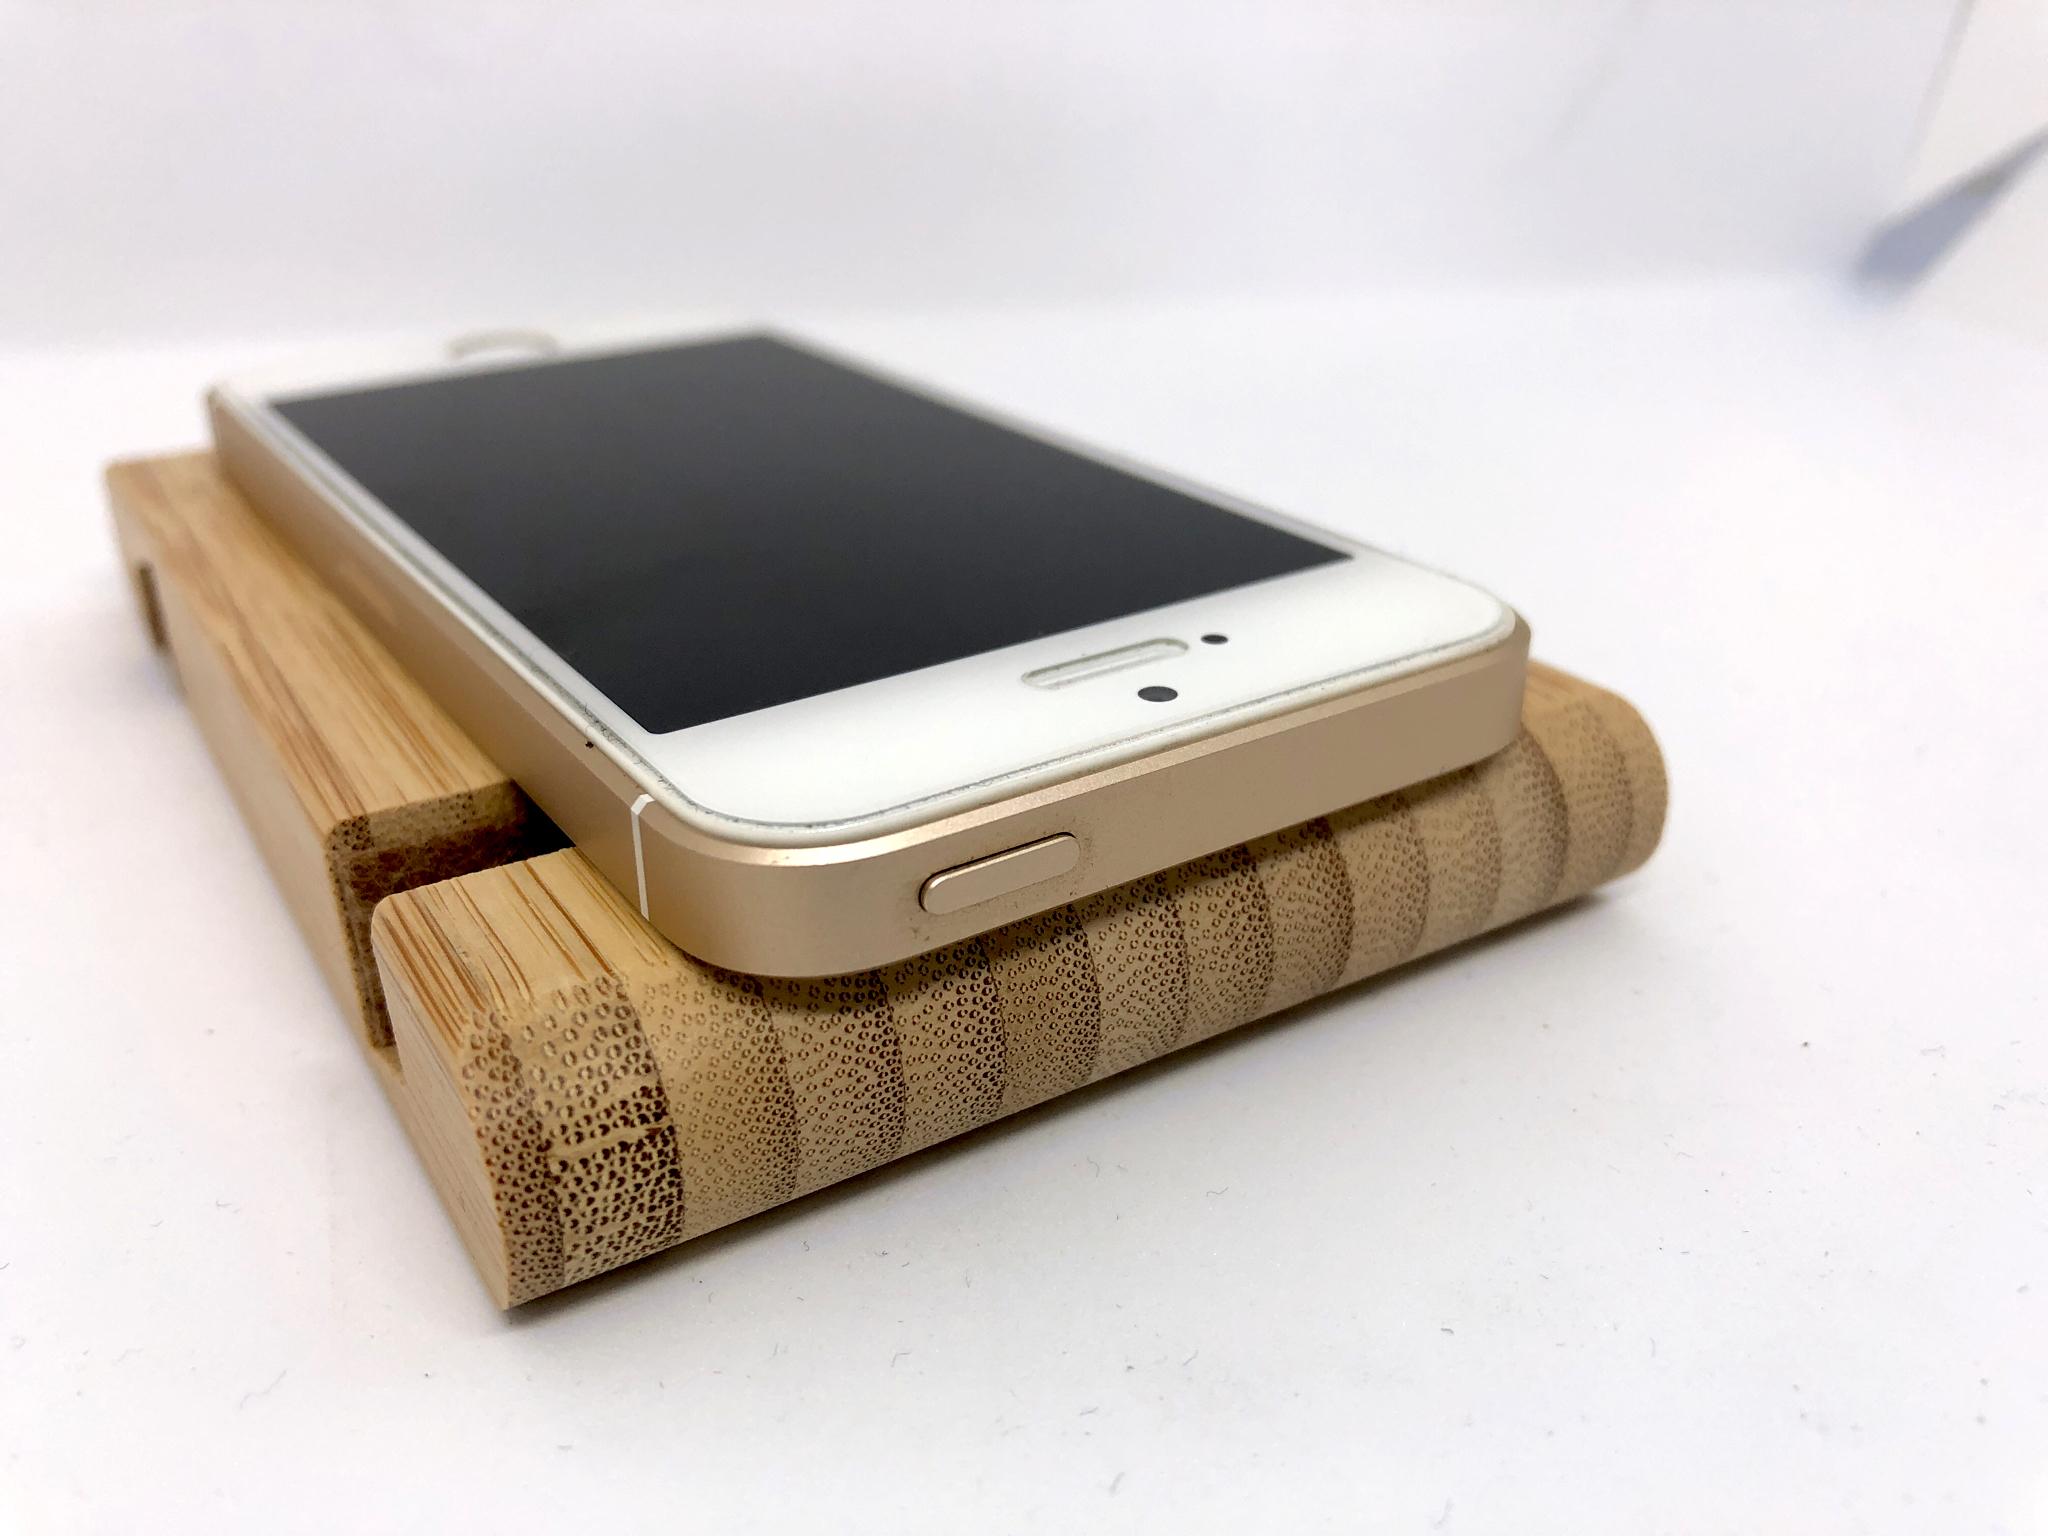 iPhone SE 16GB, 16 GB, Gold, Afbeelding 3